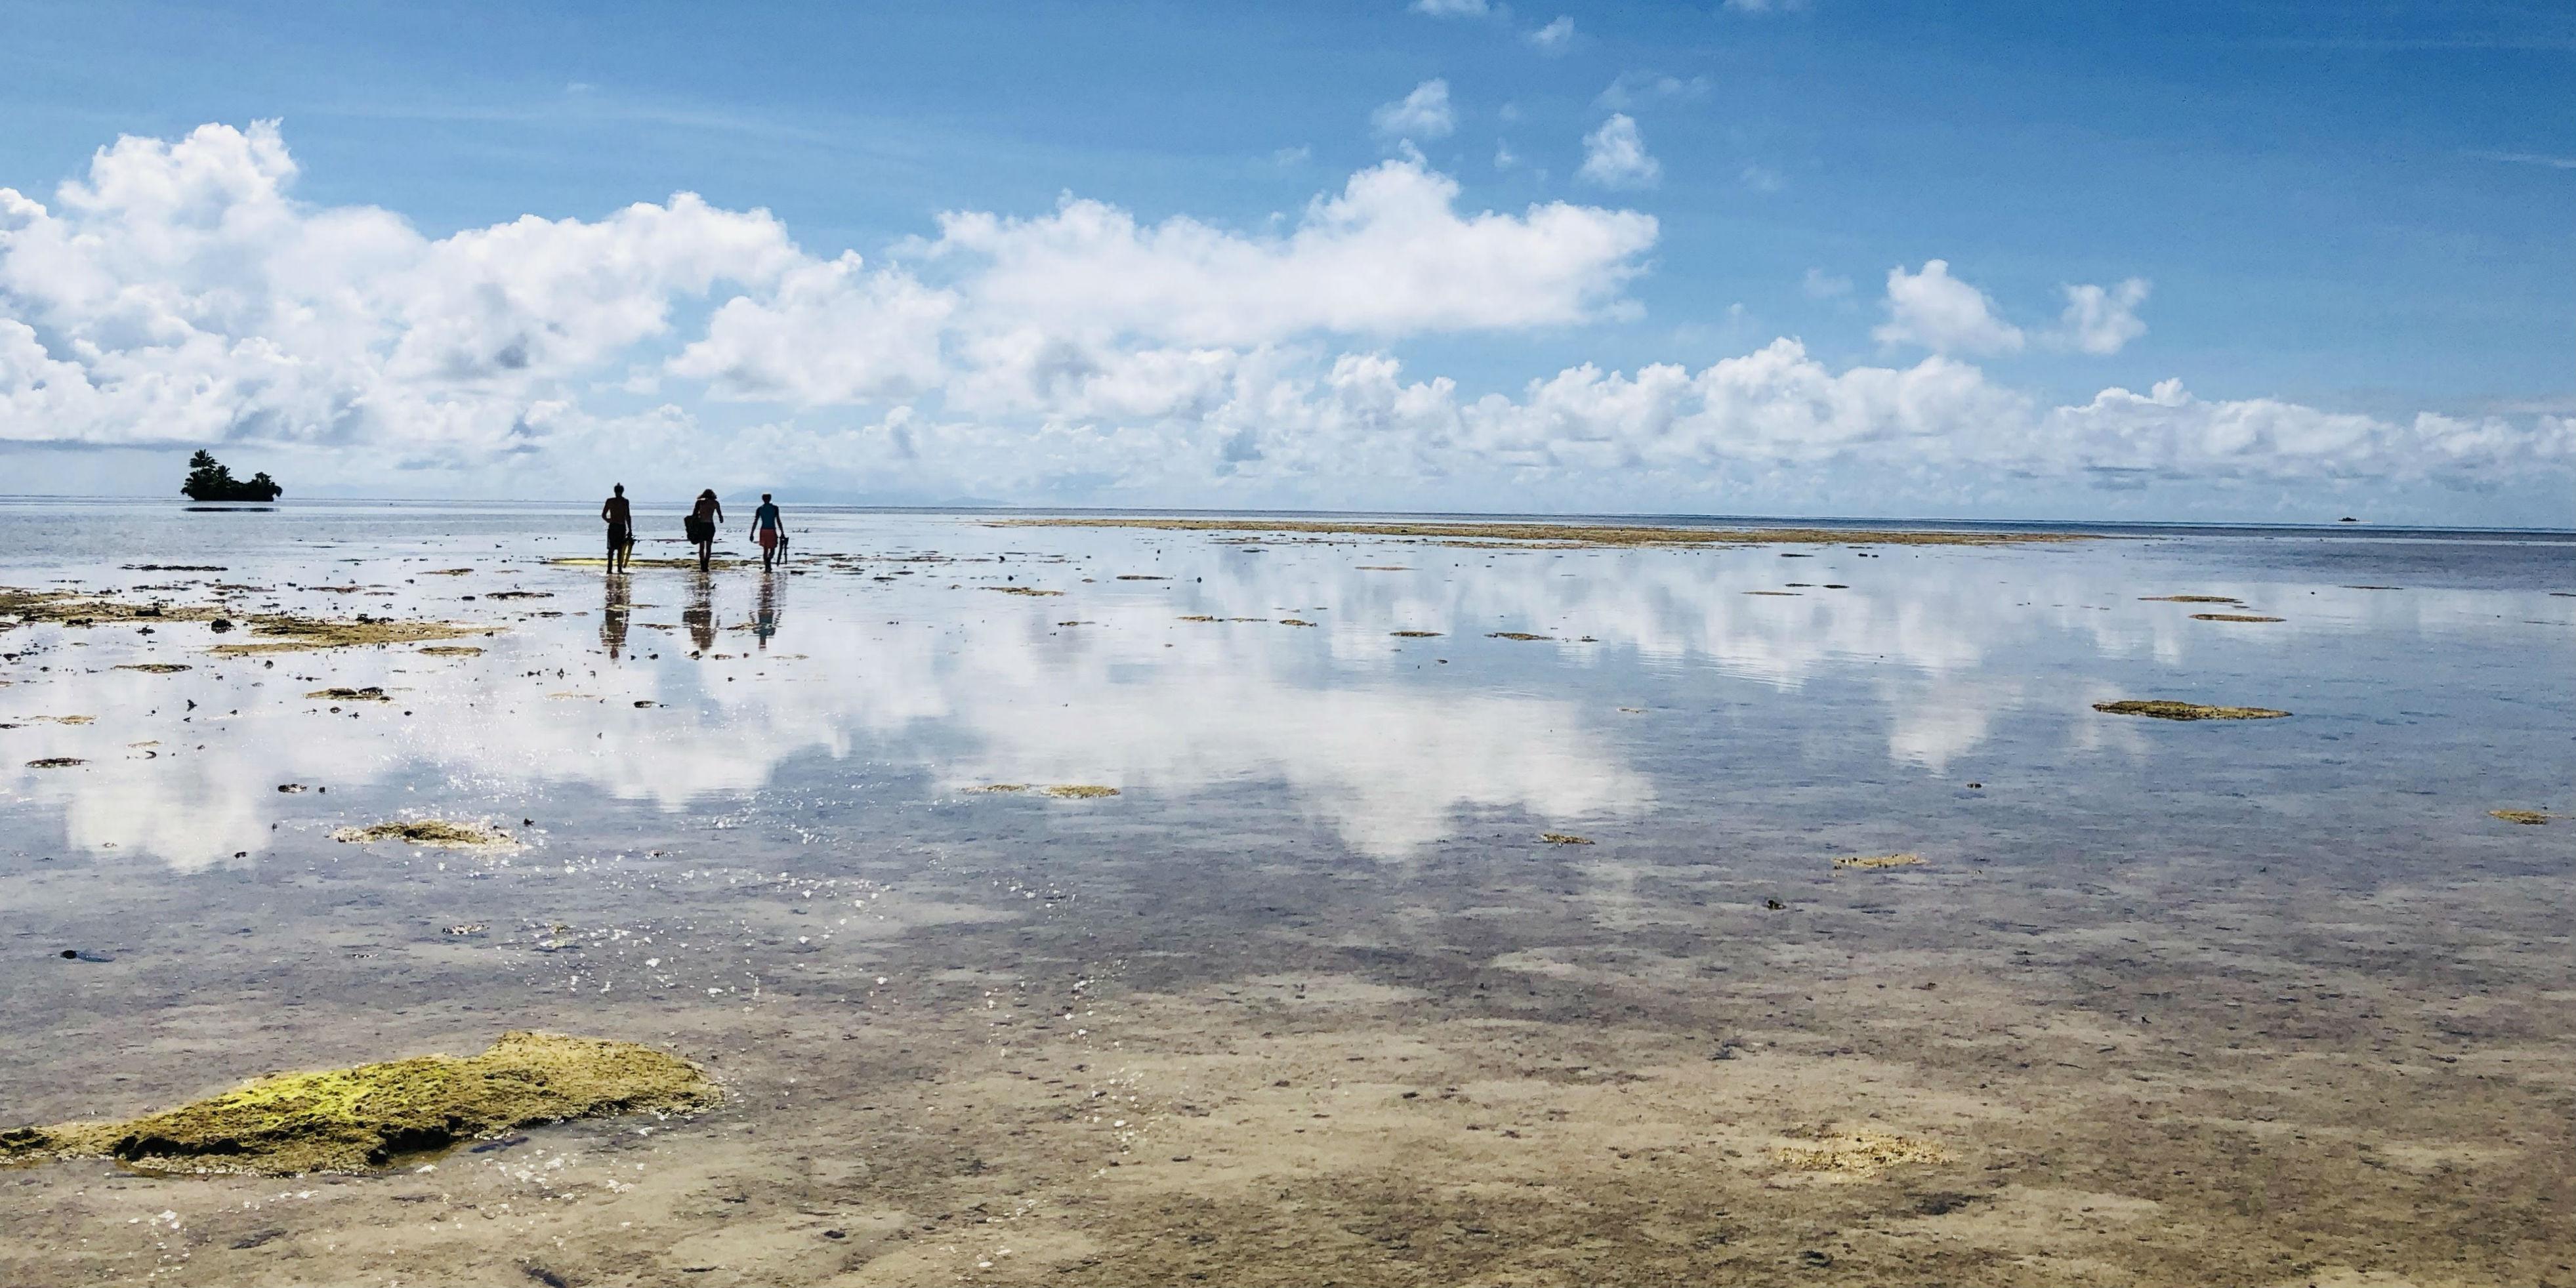 GVI participants walk toward the ocean while working to gain their PADI divemaster.